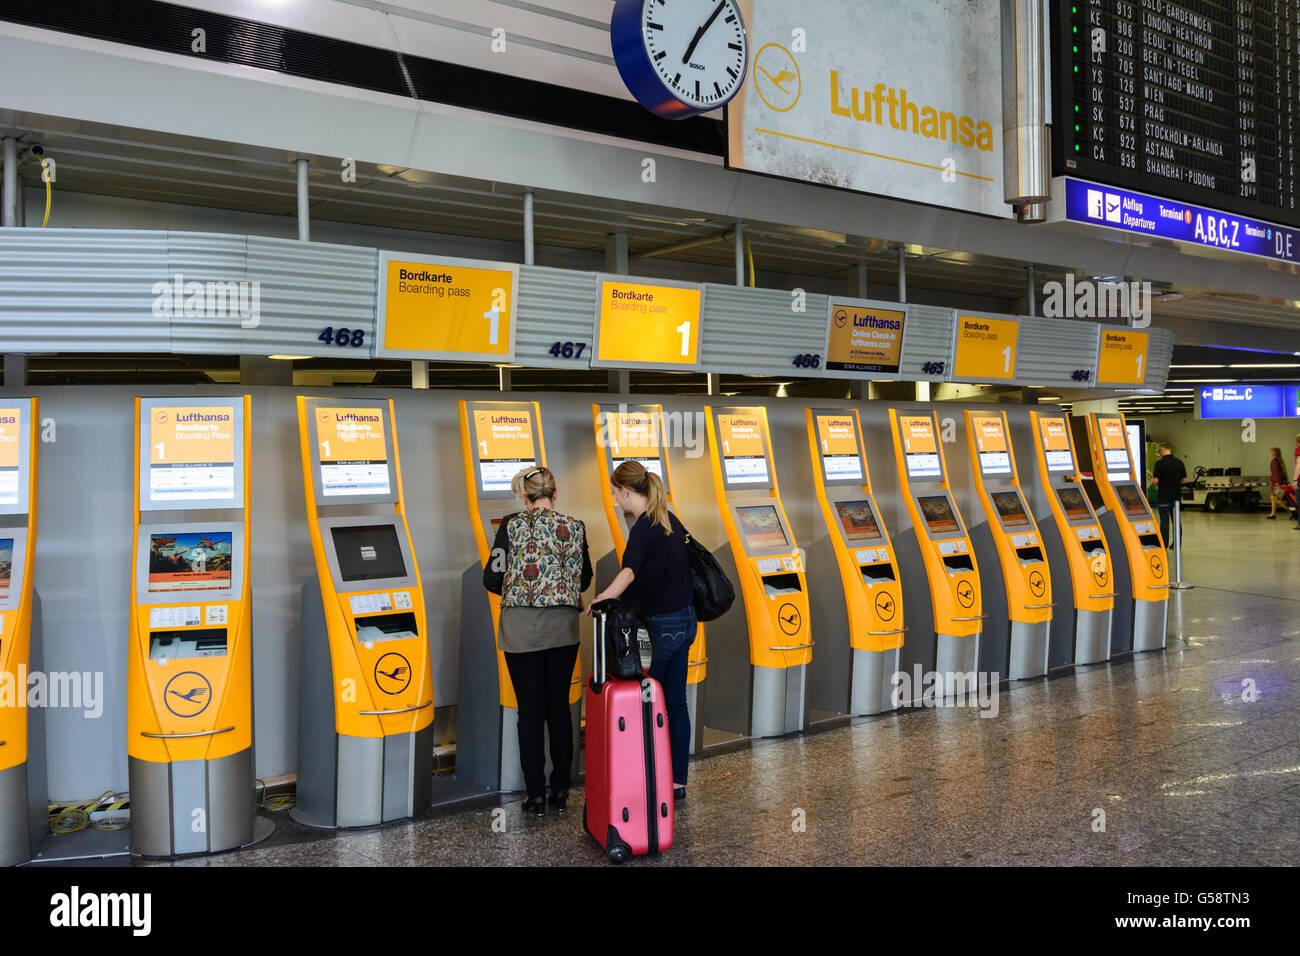 Ankunftsplan Flughafen Frankfurt